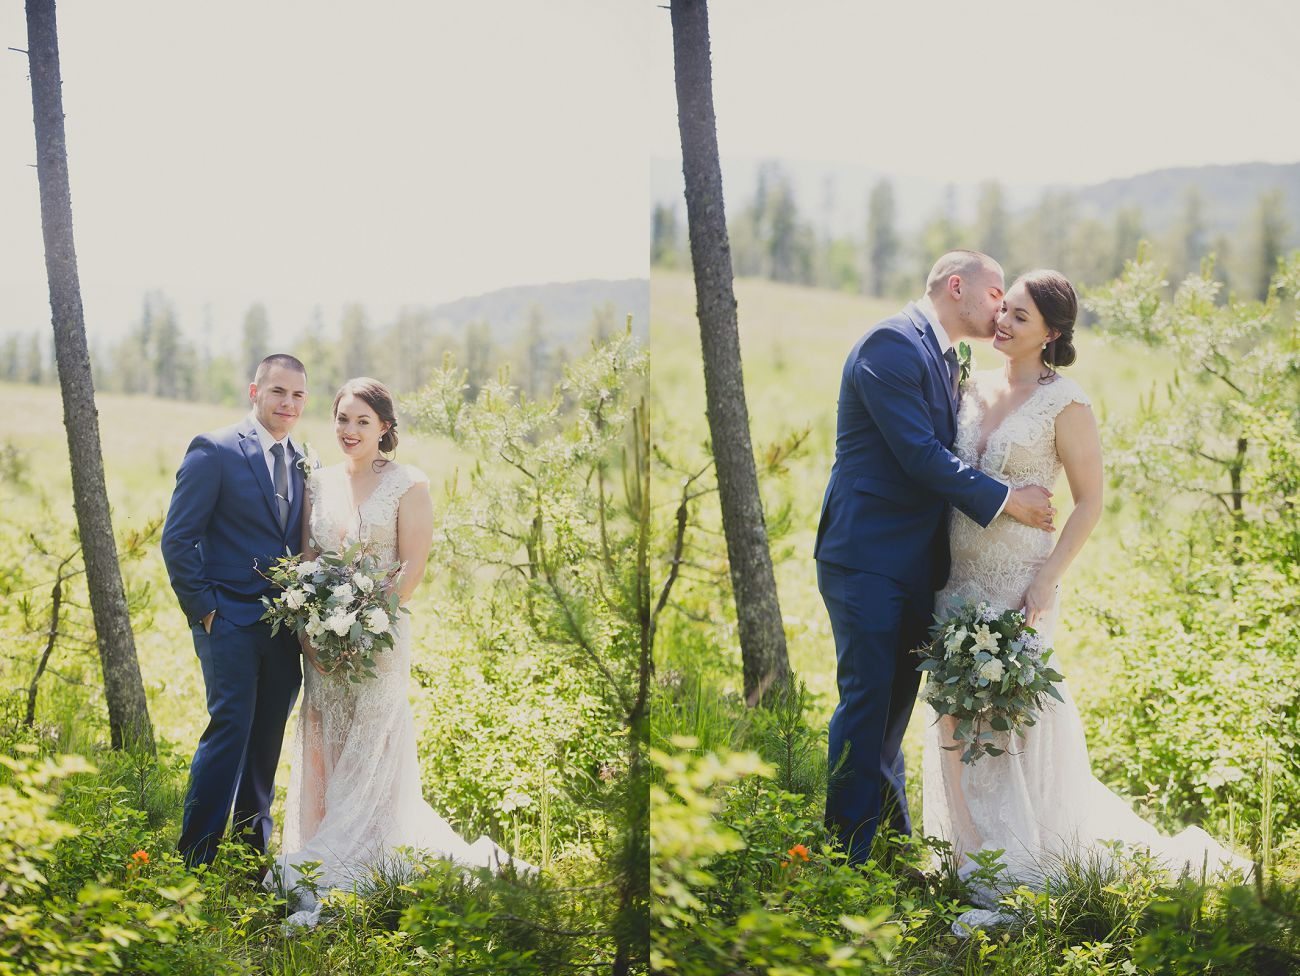 Jennifer_Mooney_Photo_Glacier_Park_Weddings_Elopement_00029.jpg